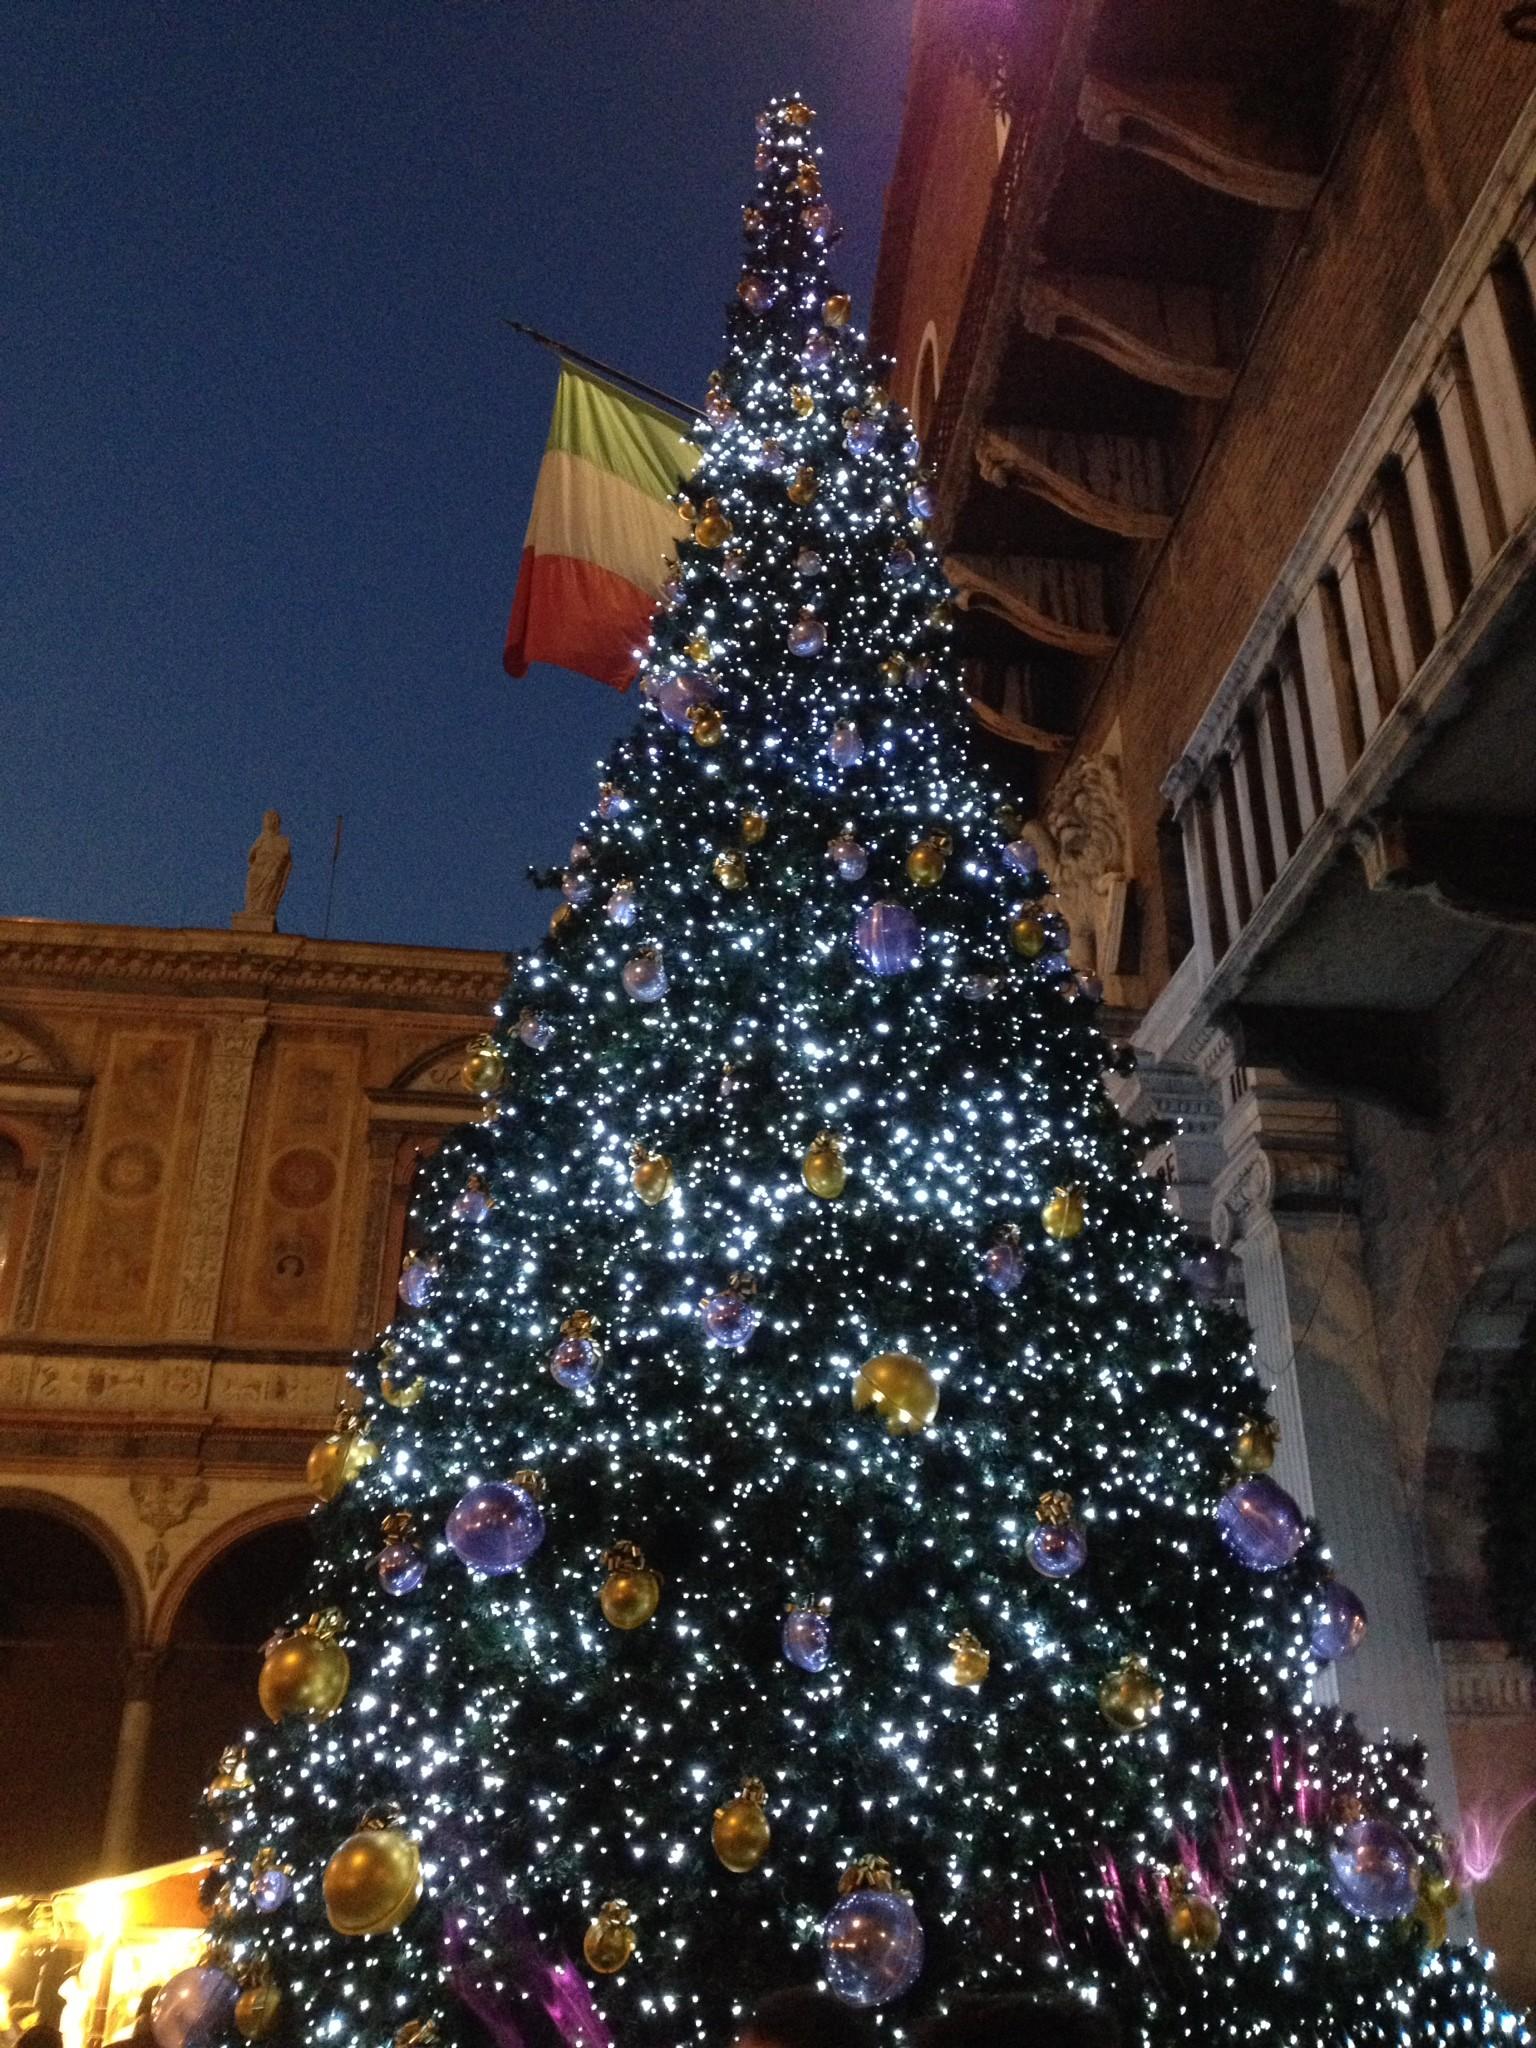 Christmas In Italy.Christmas In Italy Erasmus Blog Verona Italy